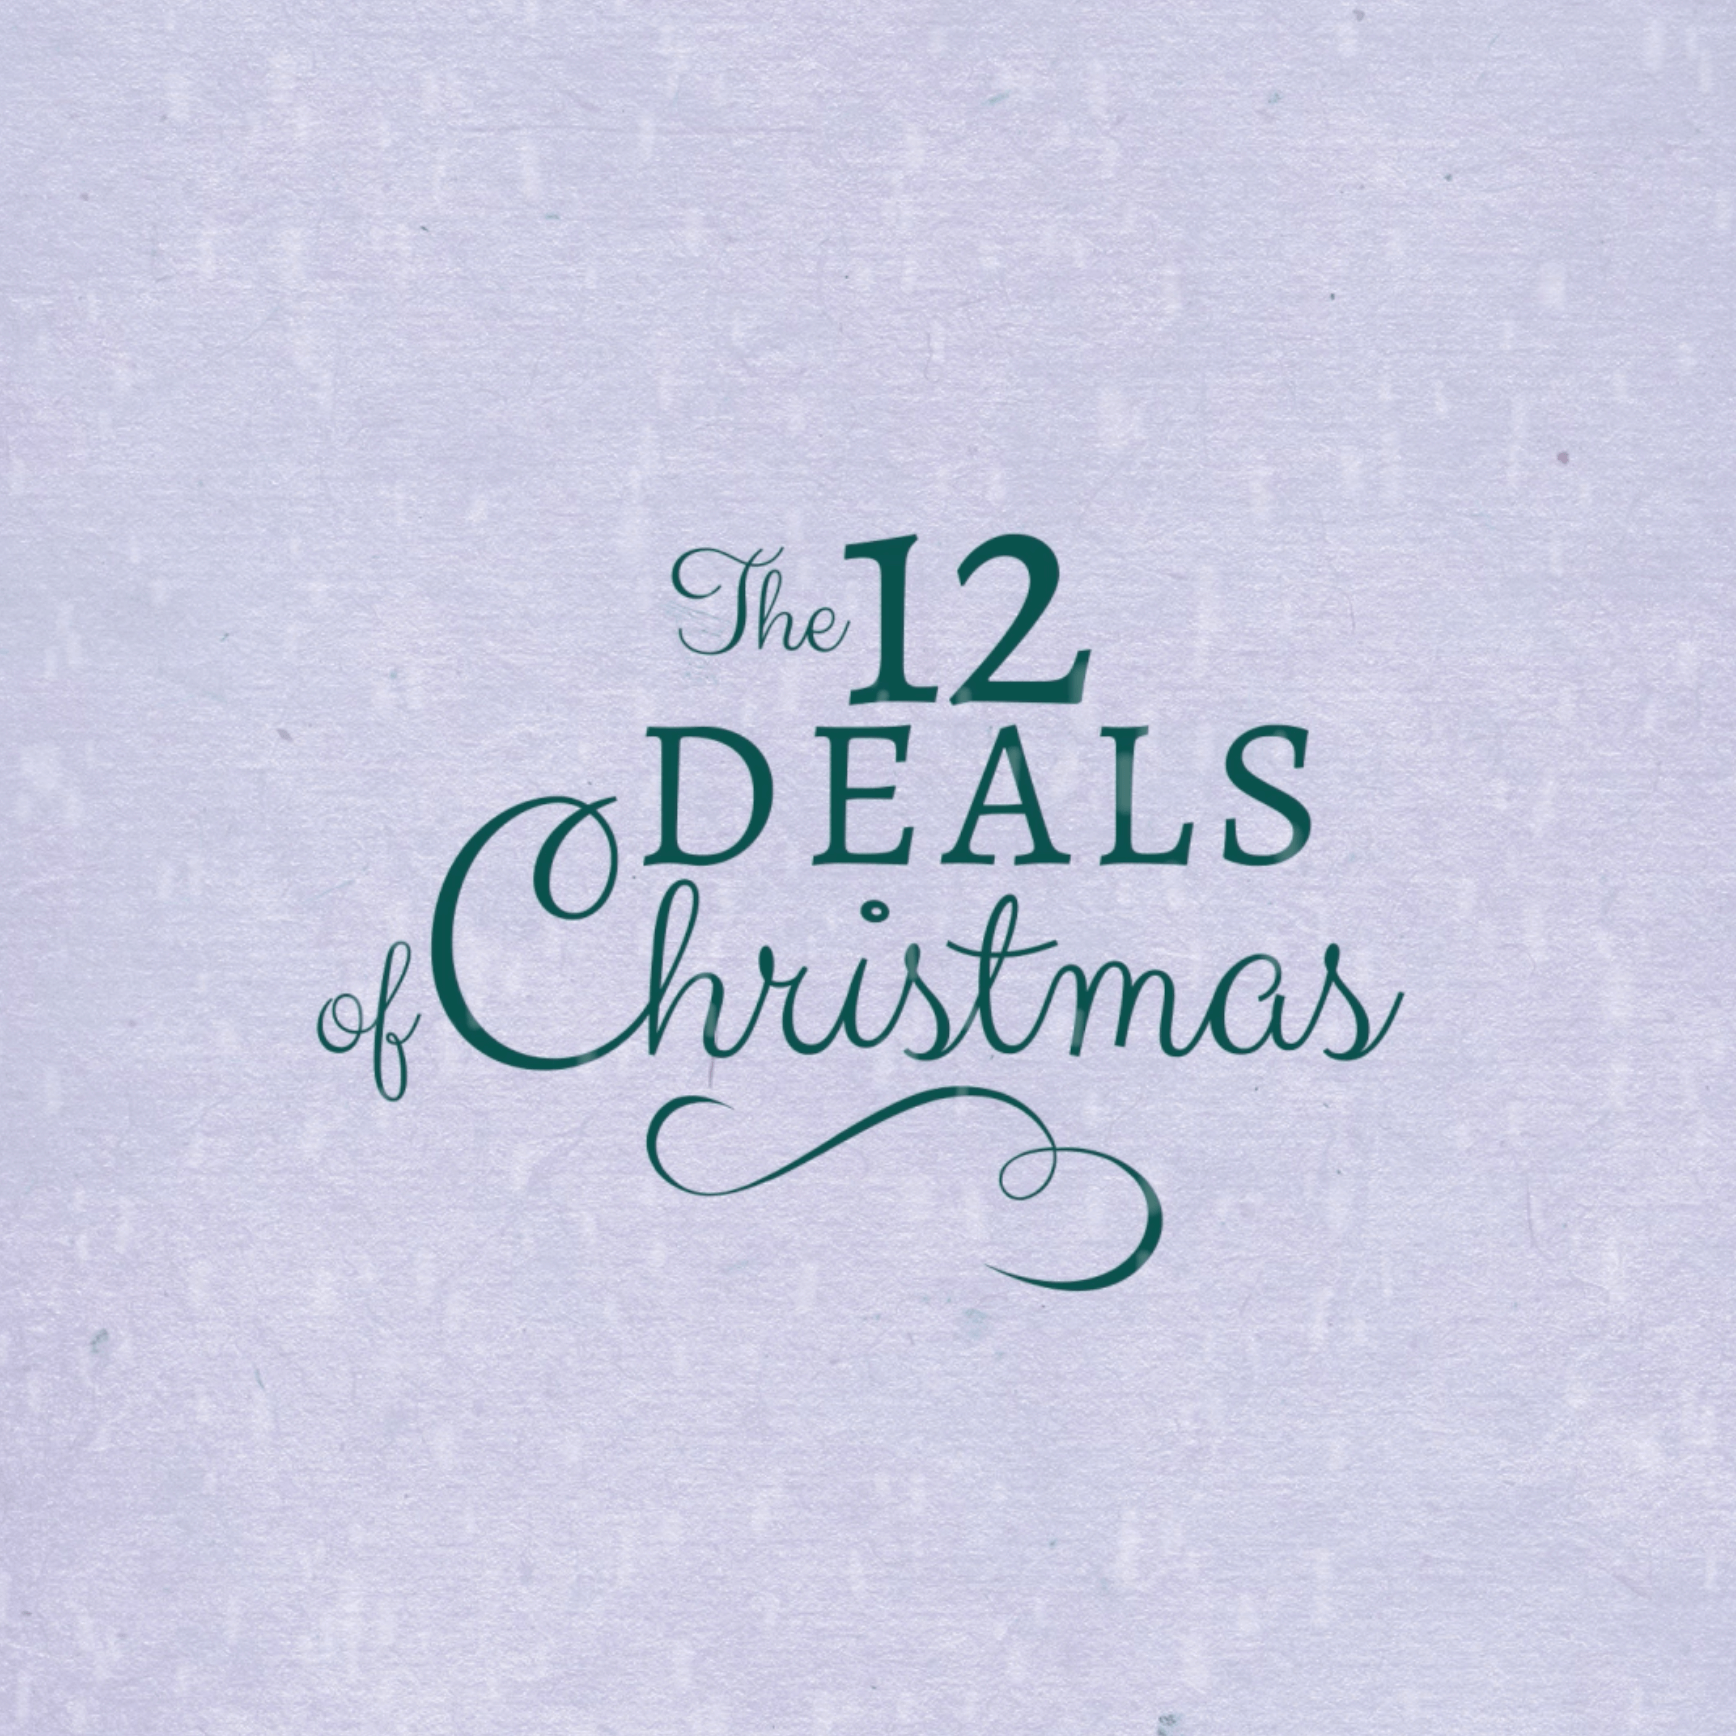 The Twelve Print Deals of Christmas